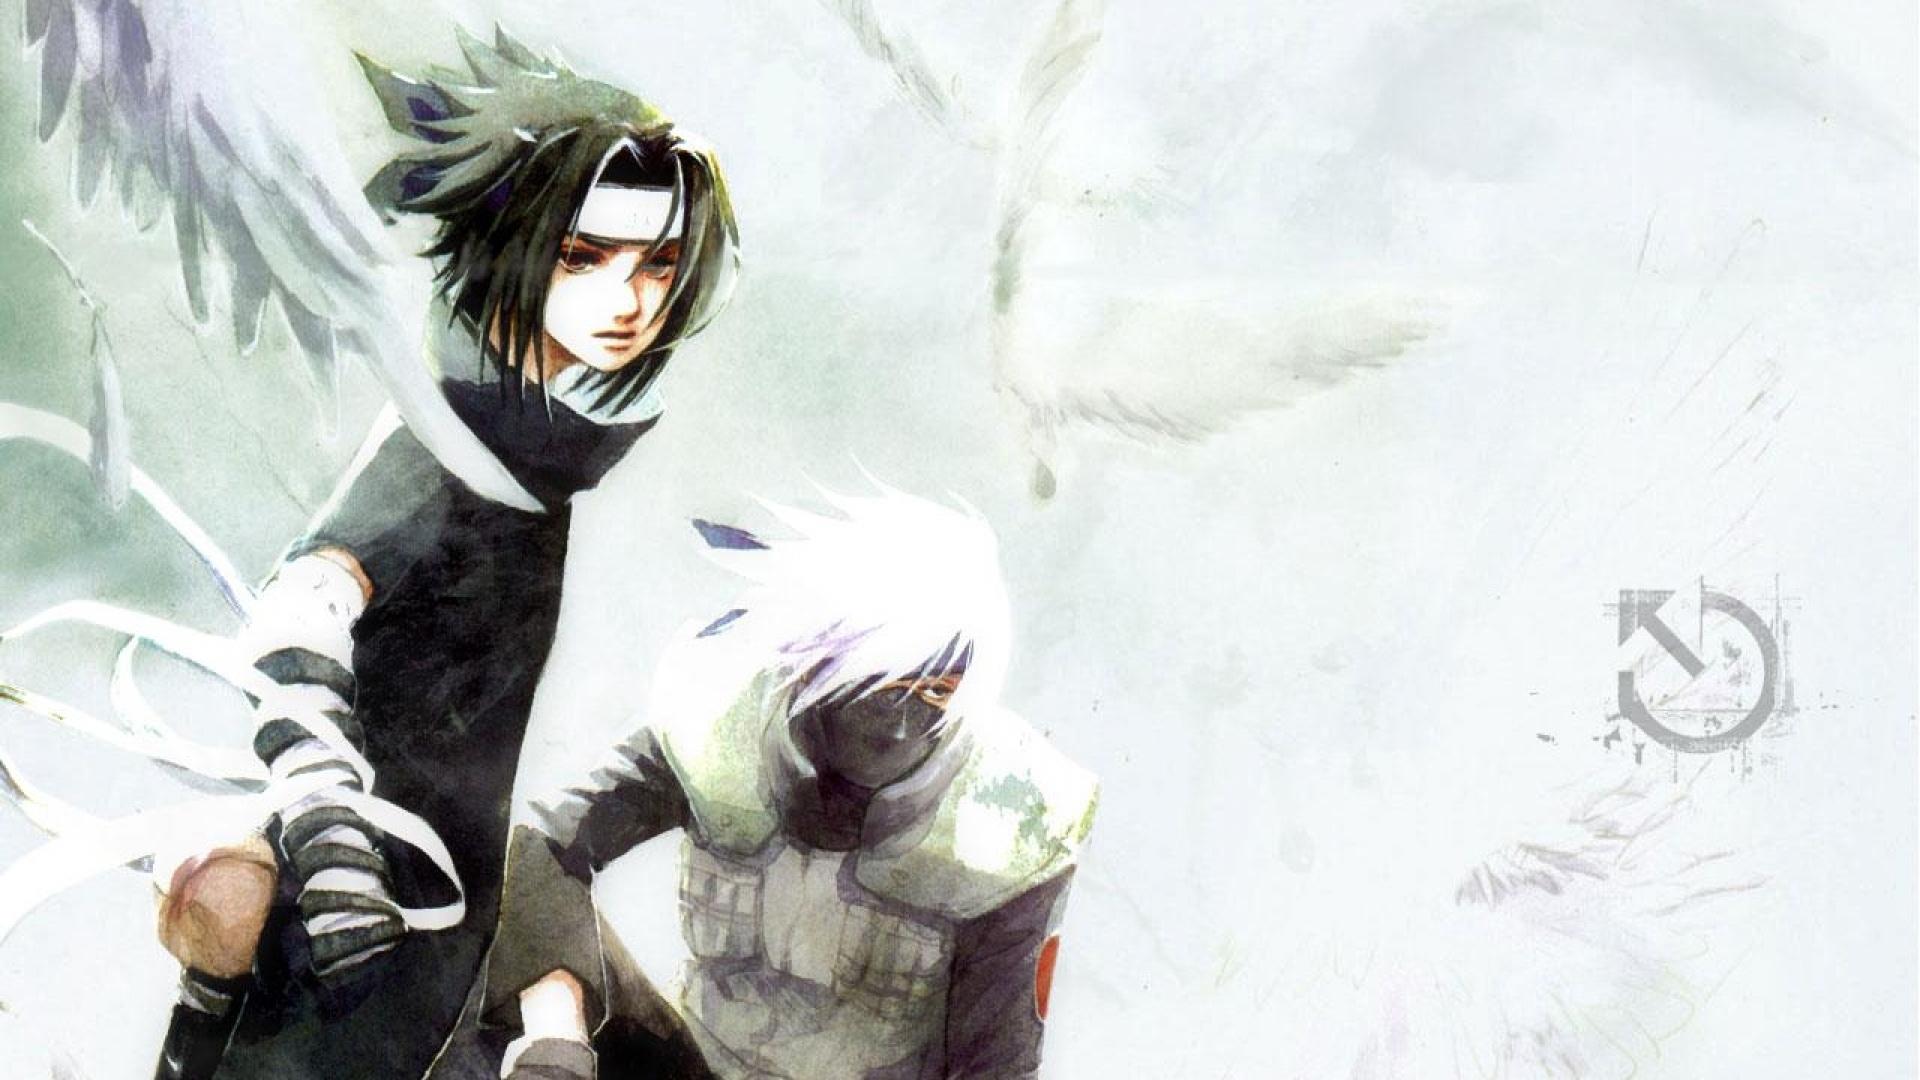 Anime Naruto wallpaper 242536 1920x1080